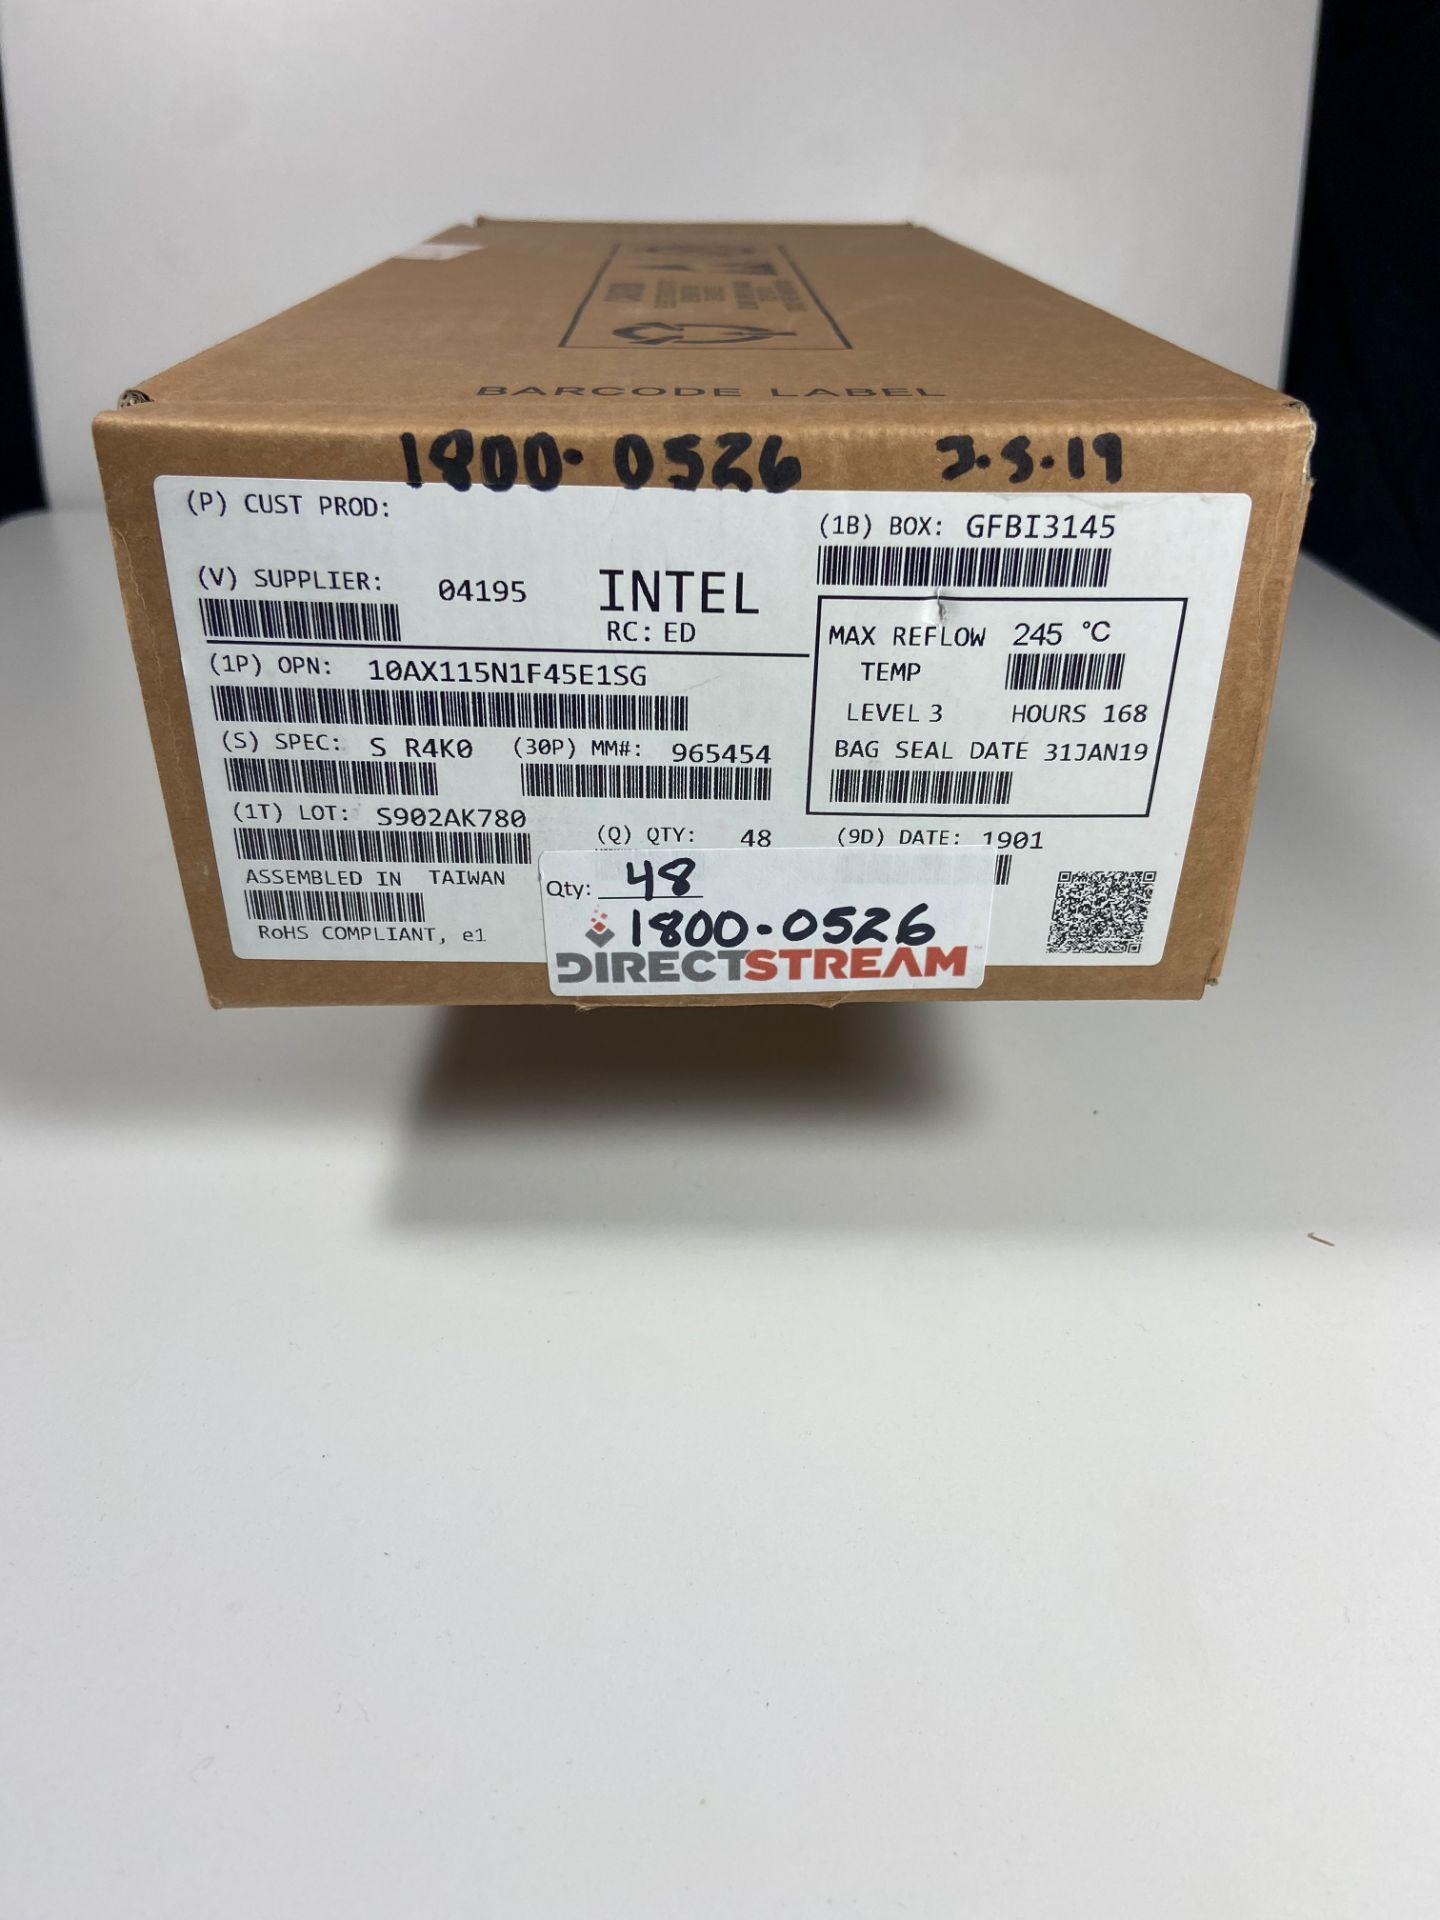 Intel 10AX115N1F45E1SG, QTY 48, FPGA Arria 10 GX Family 1150000 Cells 20nm Technology 0. - Image 3 of 4